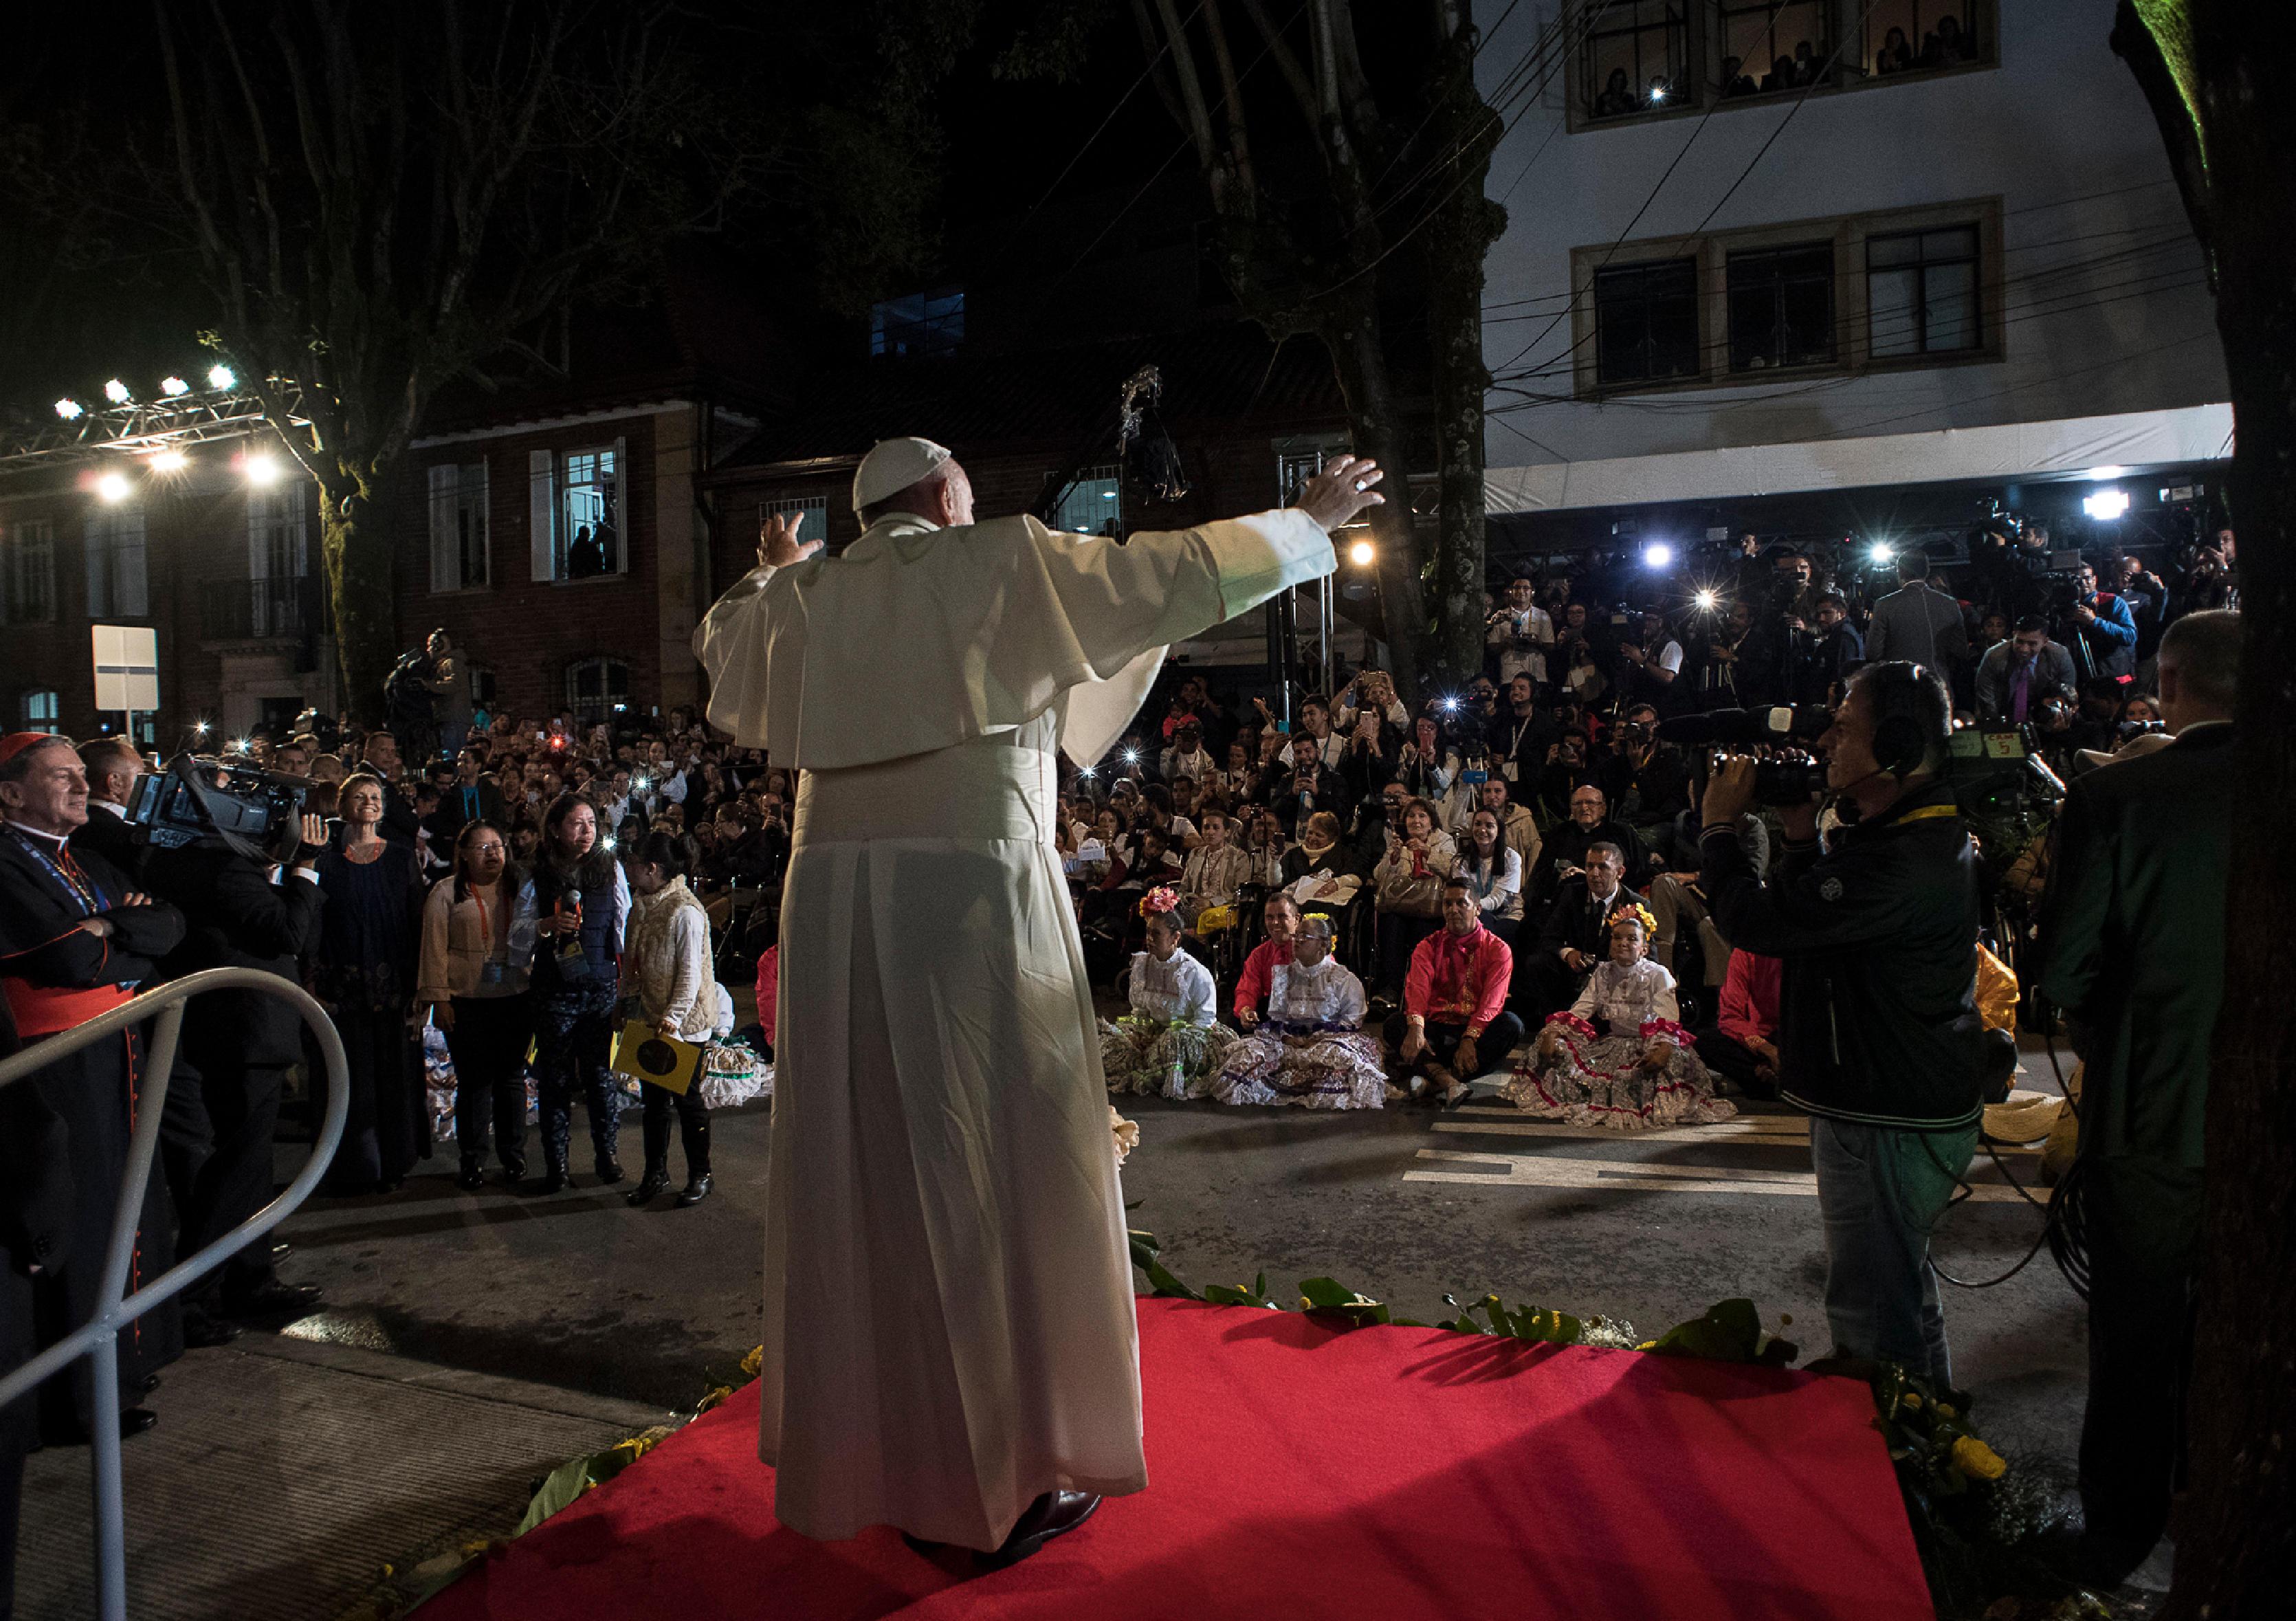 Fête à la nonciature, Bogota Colombie 07/09/2017 © L'Osservatore Romano